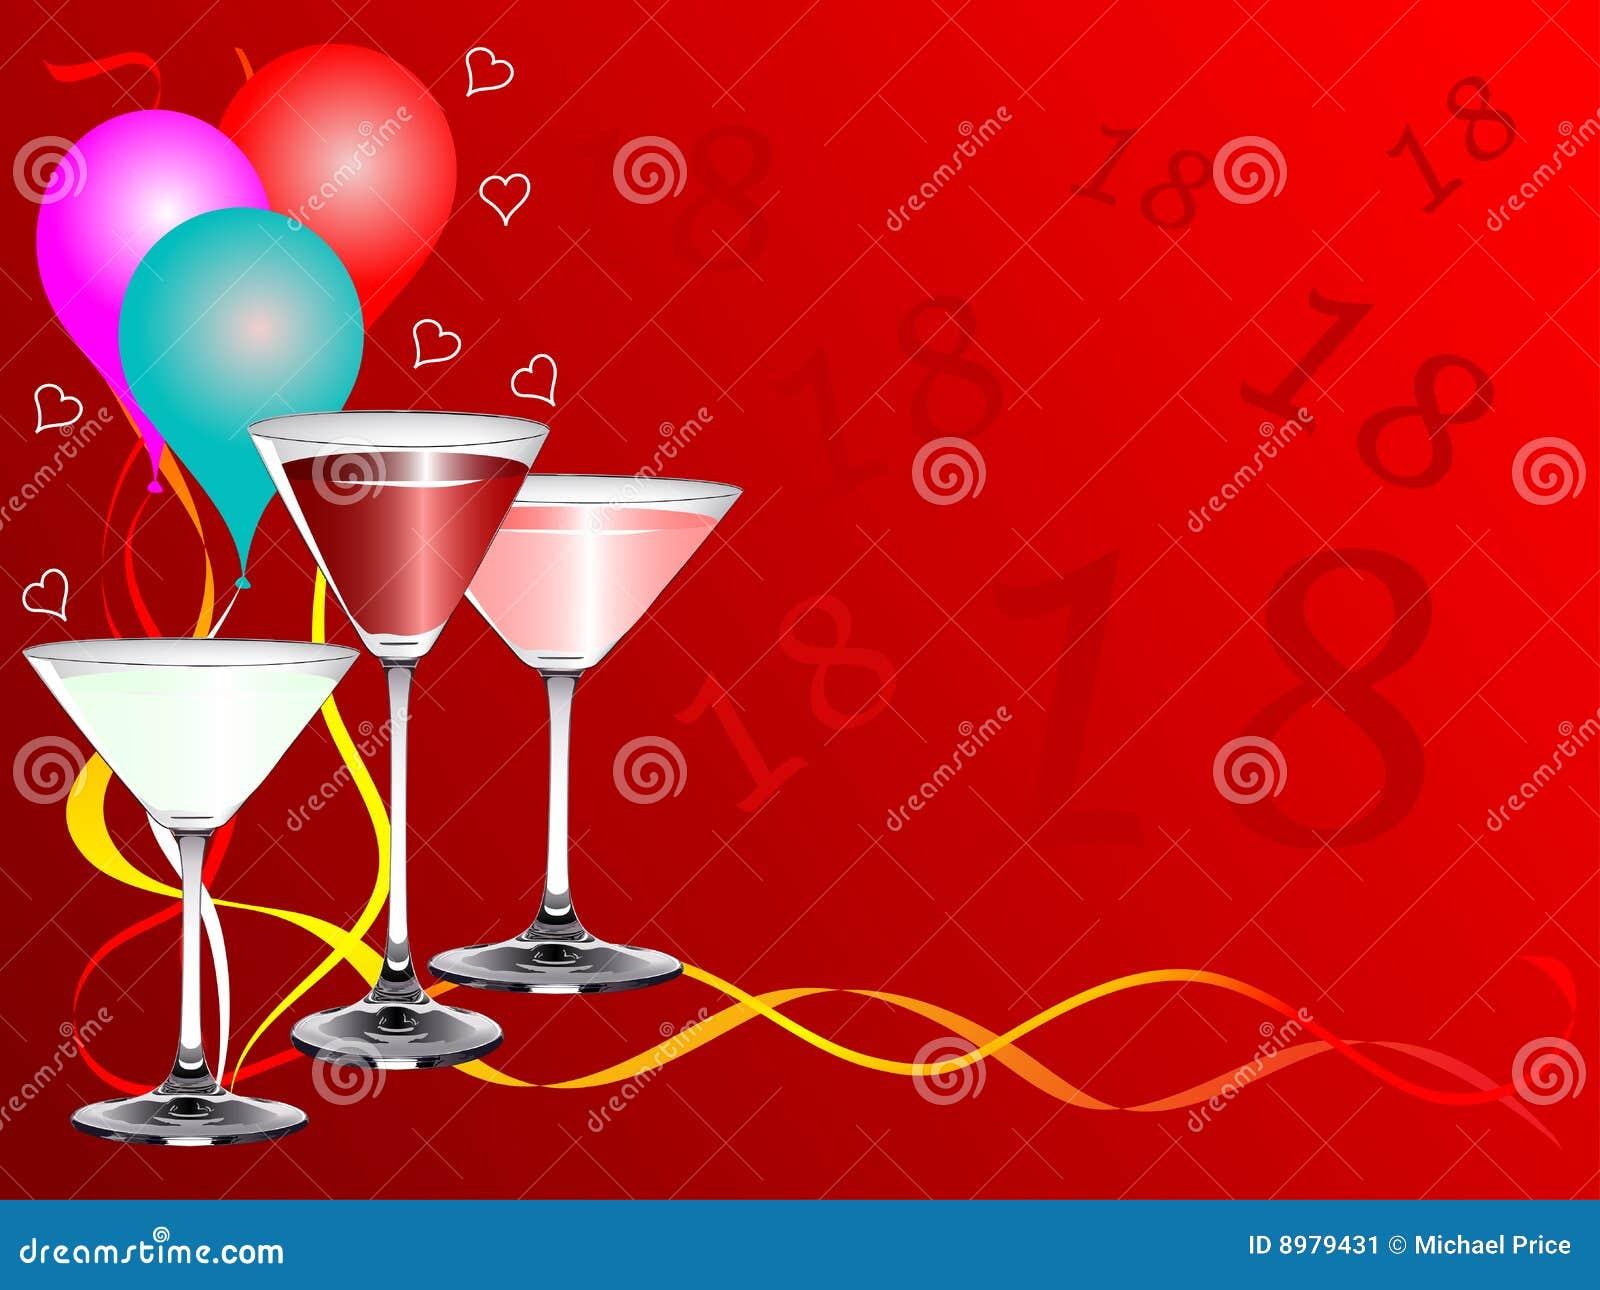 40Th Birthday Invitations Free Templates was perfect invitations example